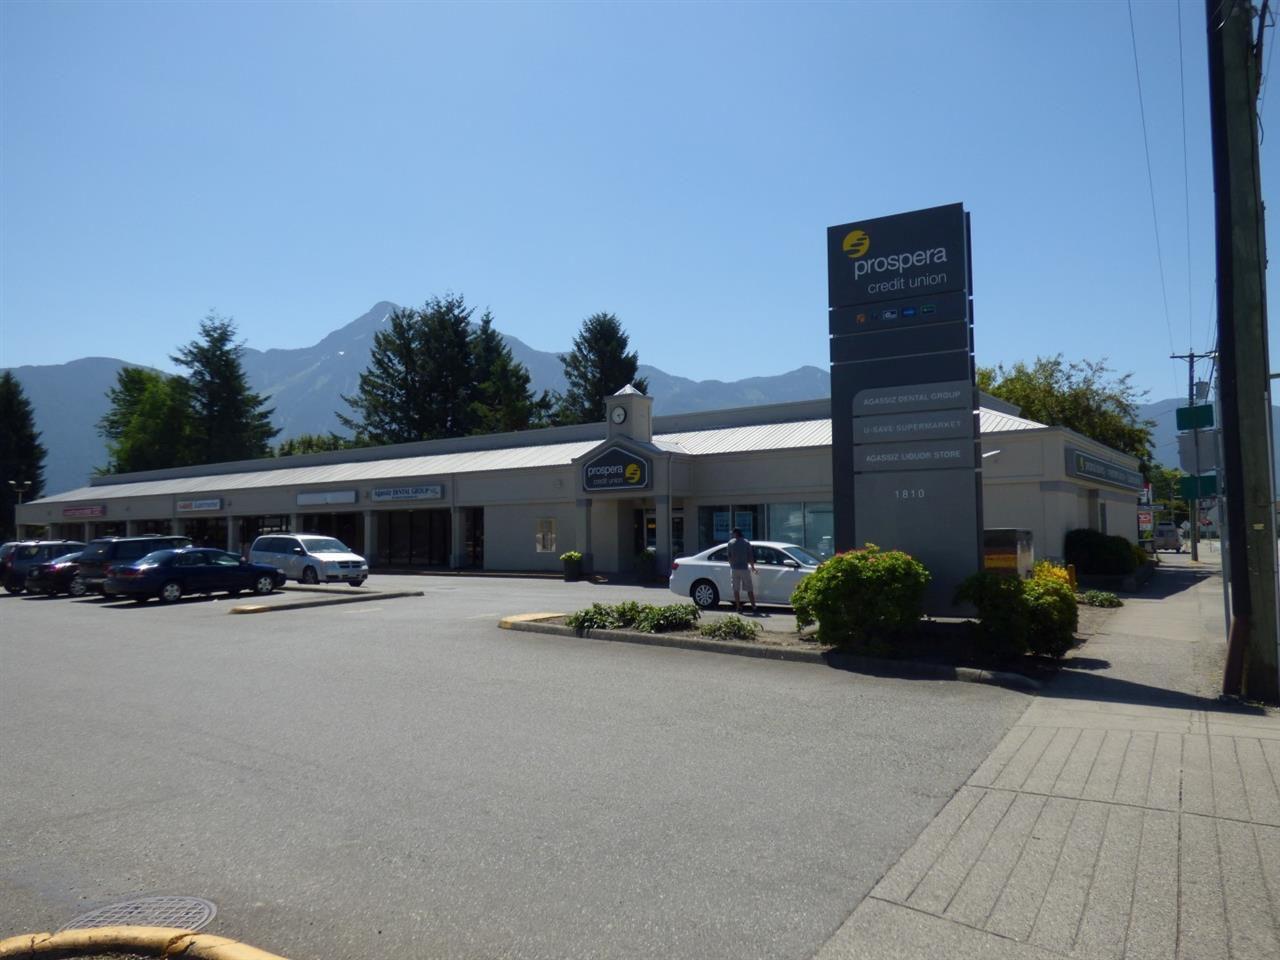 Main Photo: 1810 AGASSIZ-ROSEDALE Highway: Agassiz Retail for lease : MLS®# C8010629